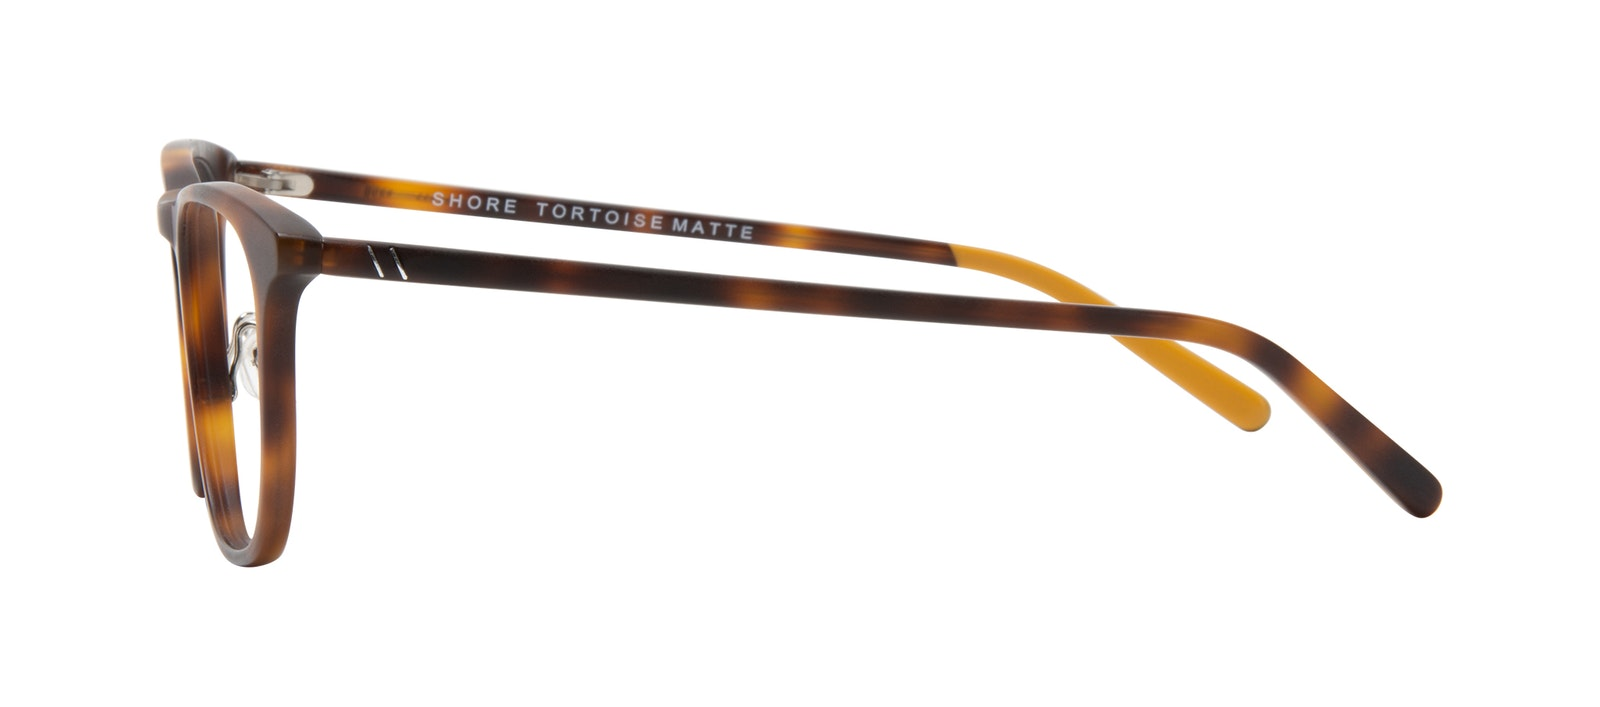 Affordable Fashion Glasses Square Eyeglasses Men Shore Tortoise Matte Side